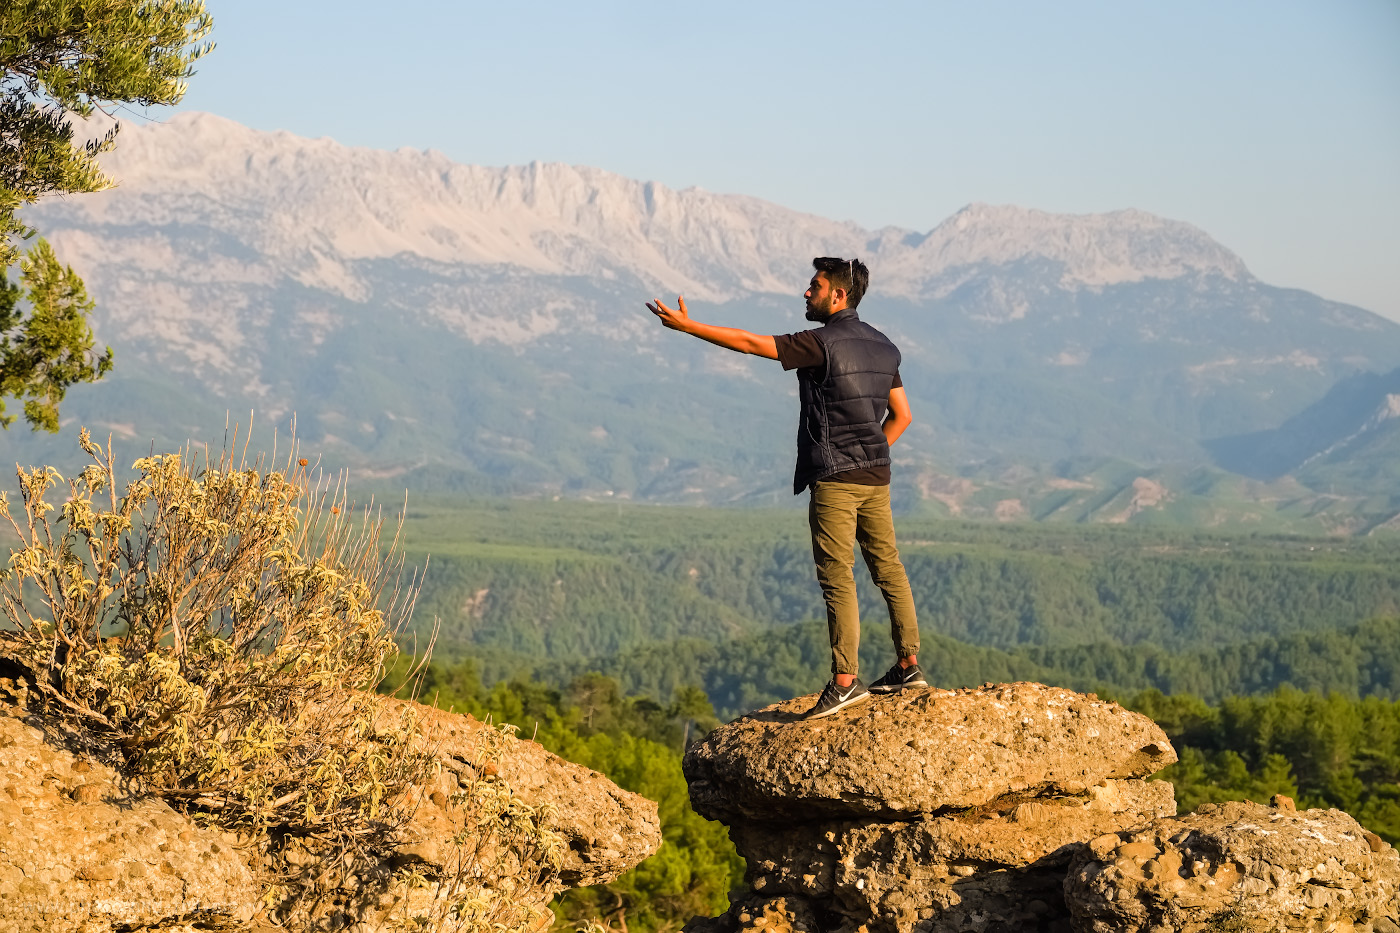 19. Фотограф в каньоне Tazi Kanyonu. 1/3200, 4.5, 200, -1.33, 55.